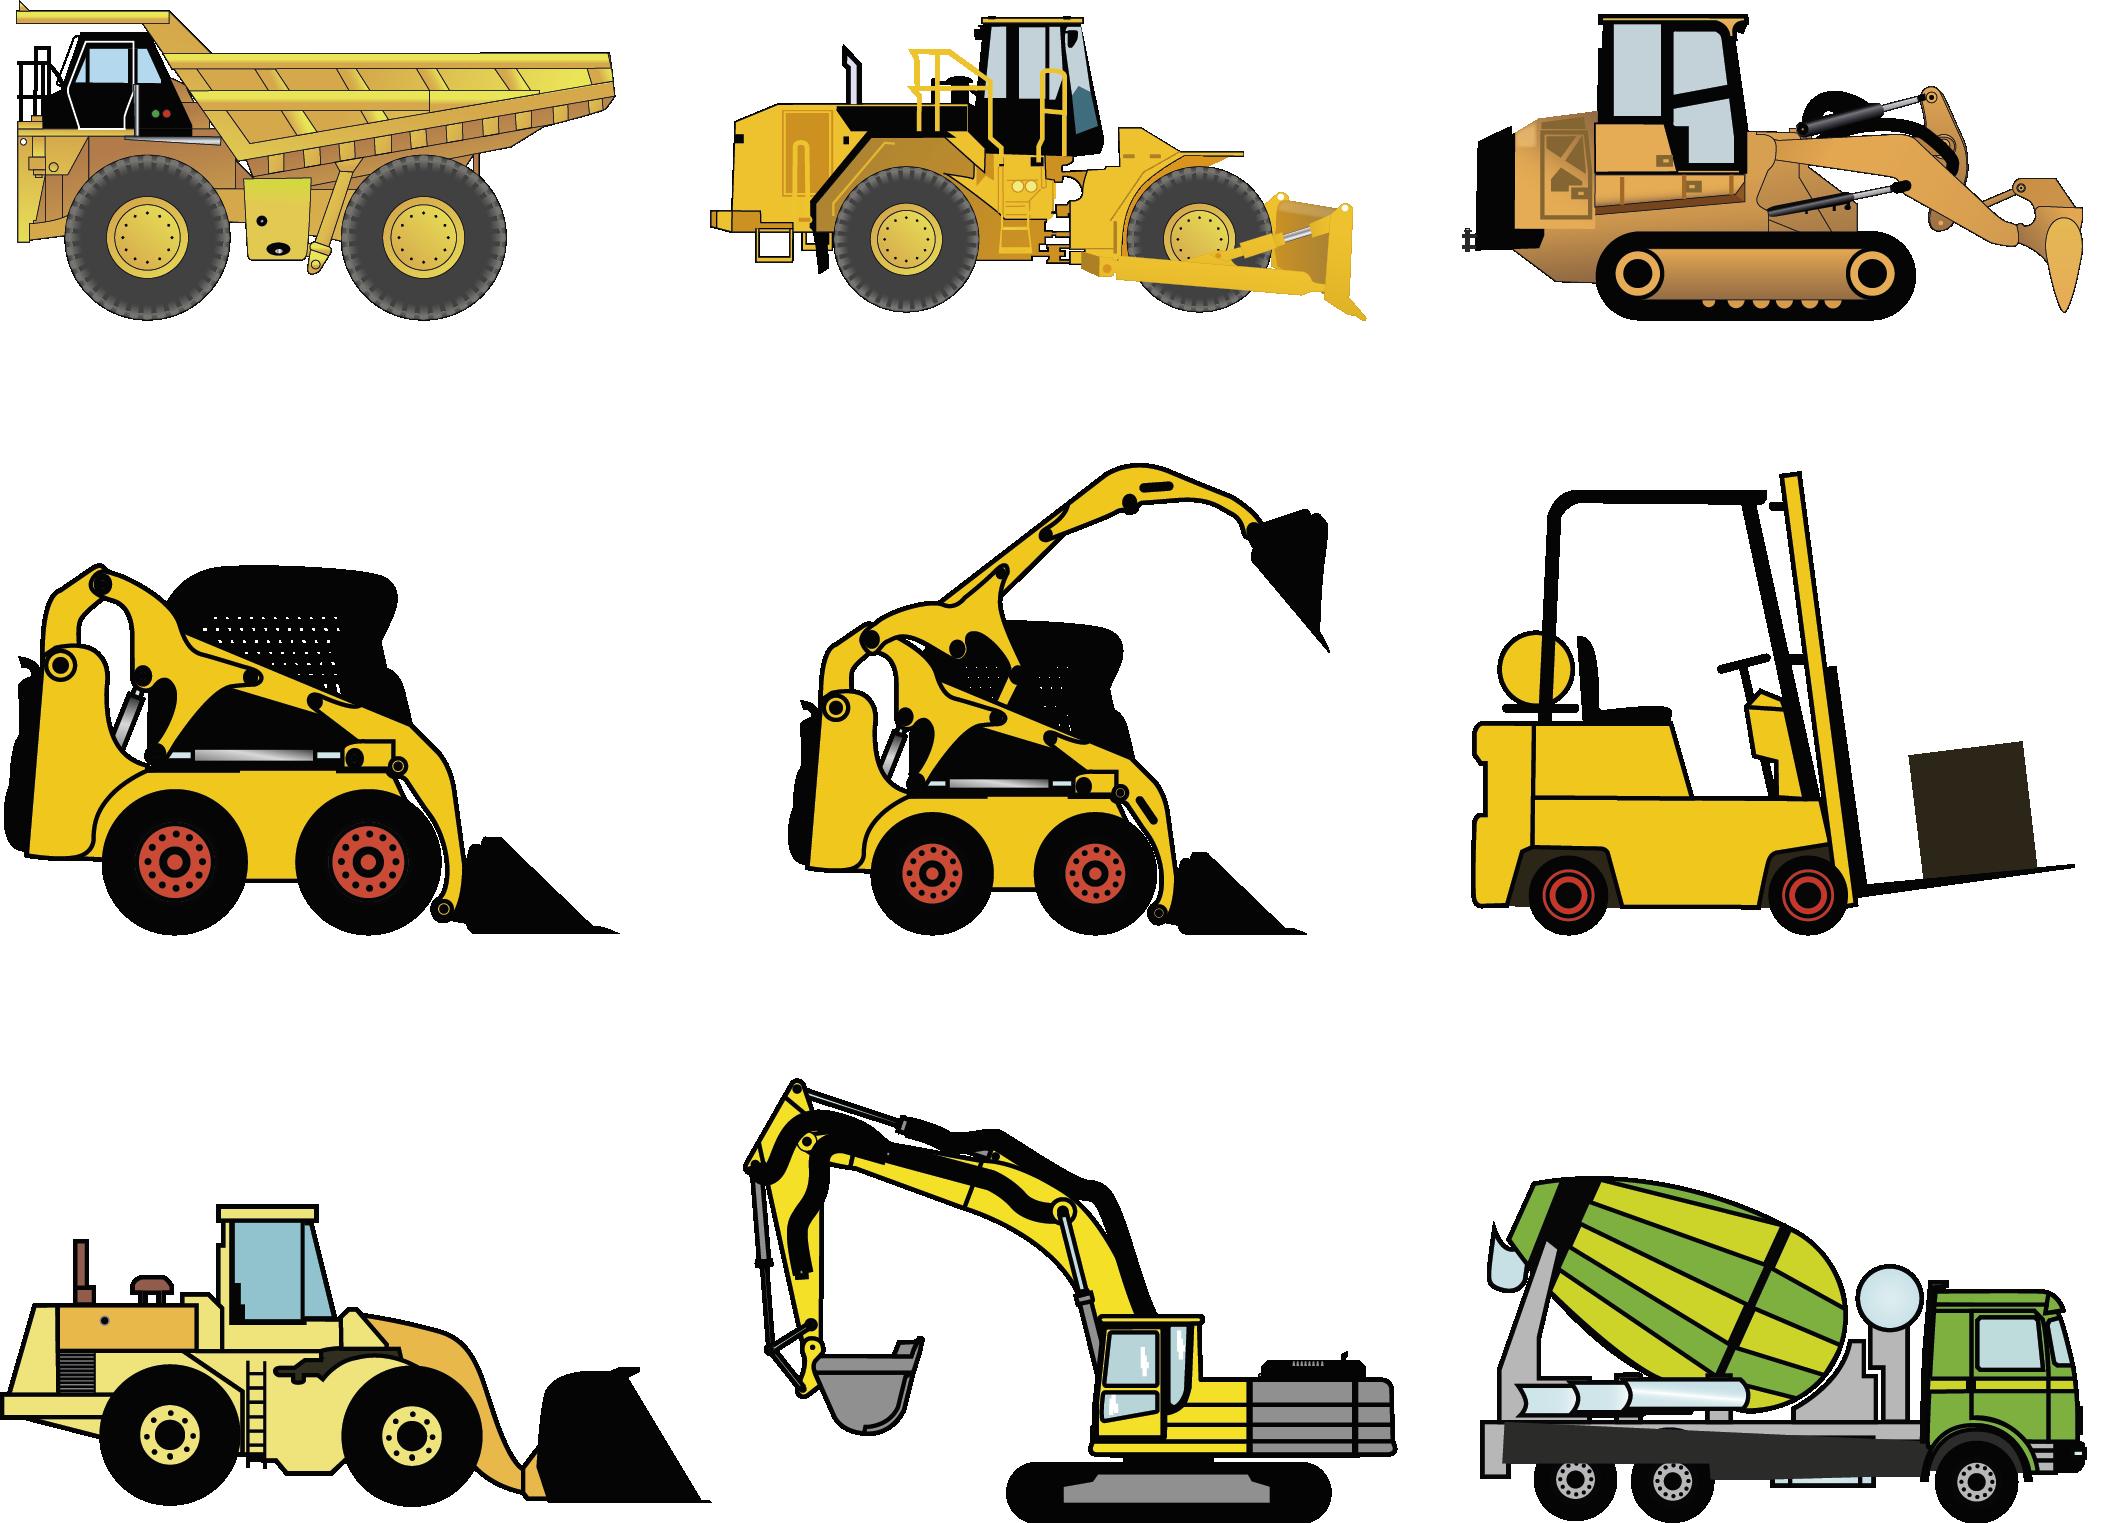 Architectural engineering Heavy equipment Truck Vehicle.